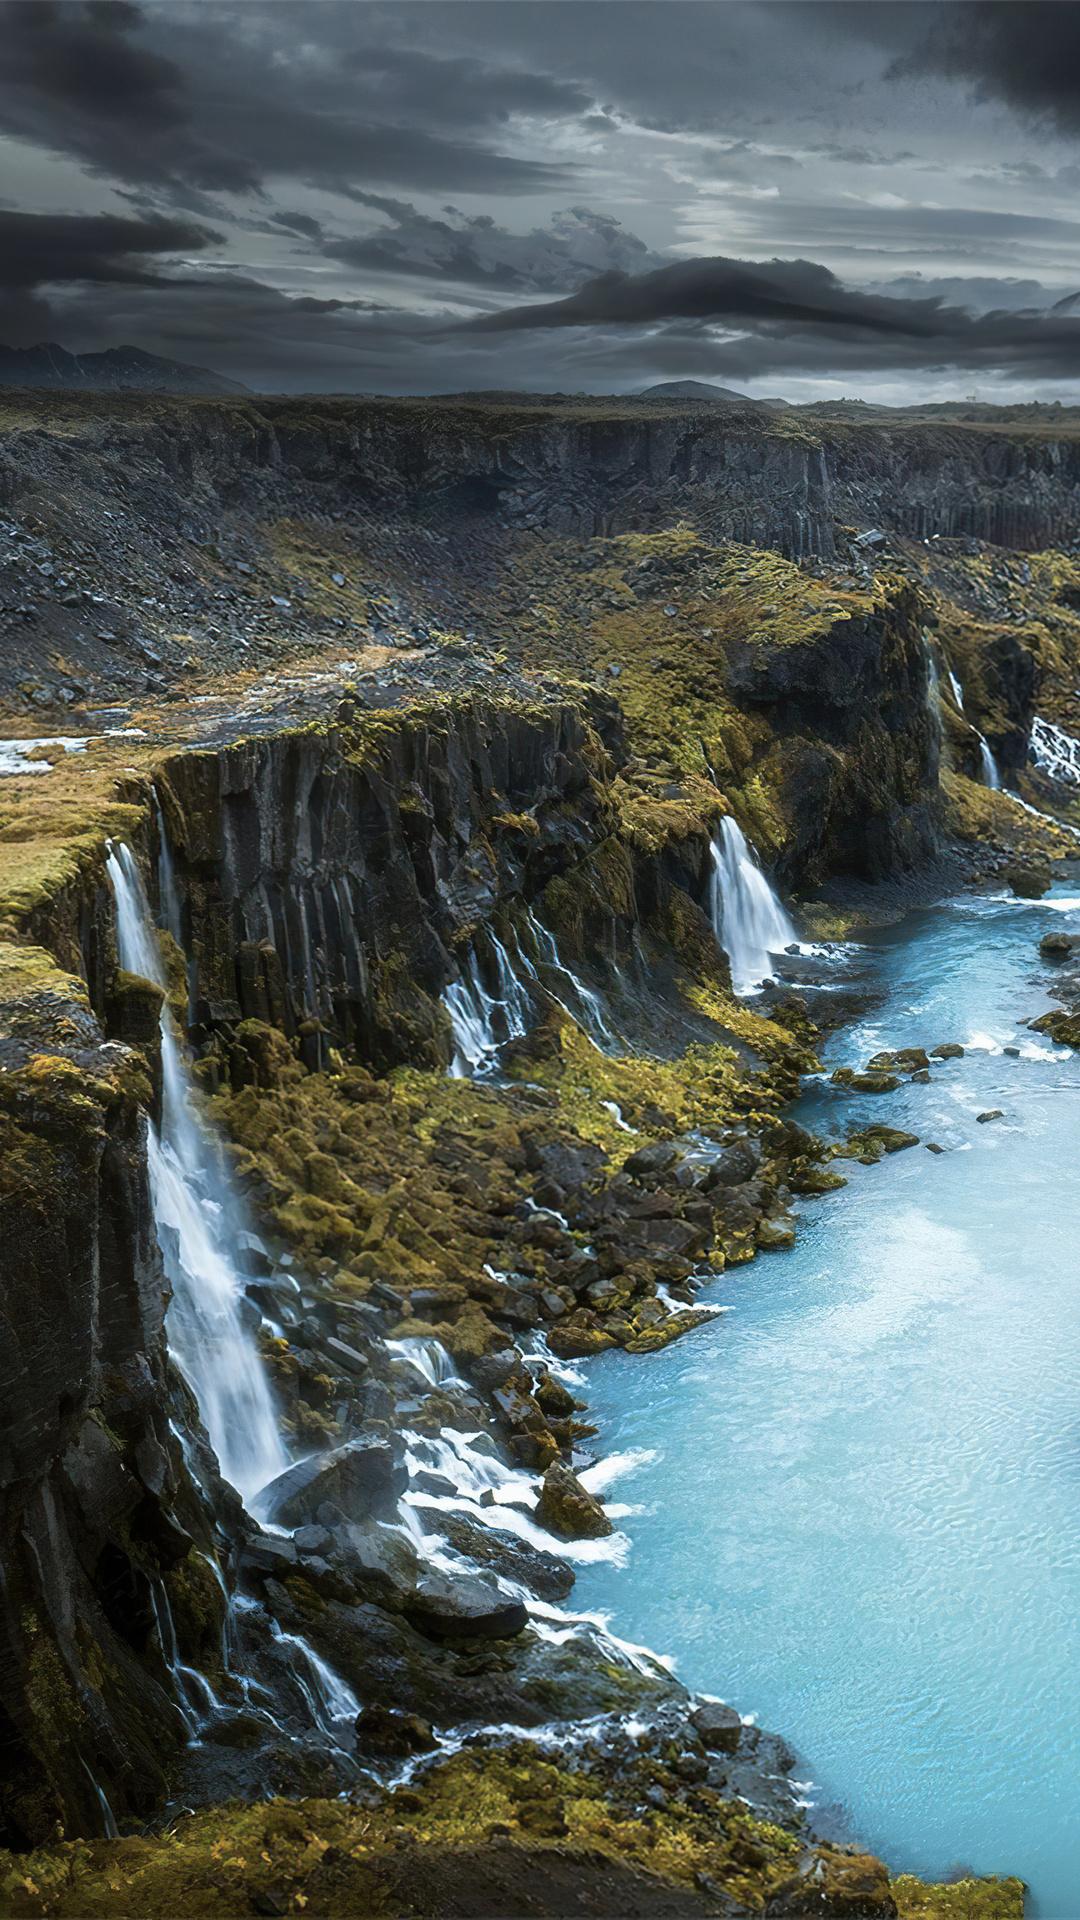 highlands-iceland-5k-yb.jpg